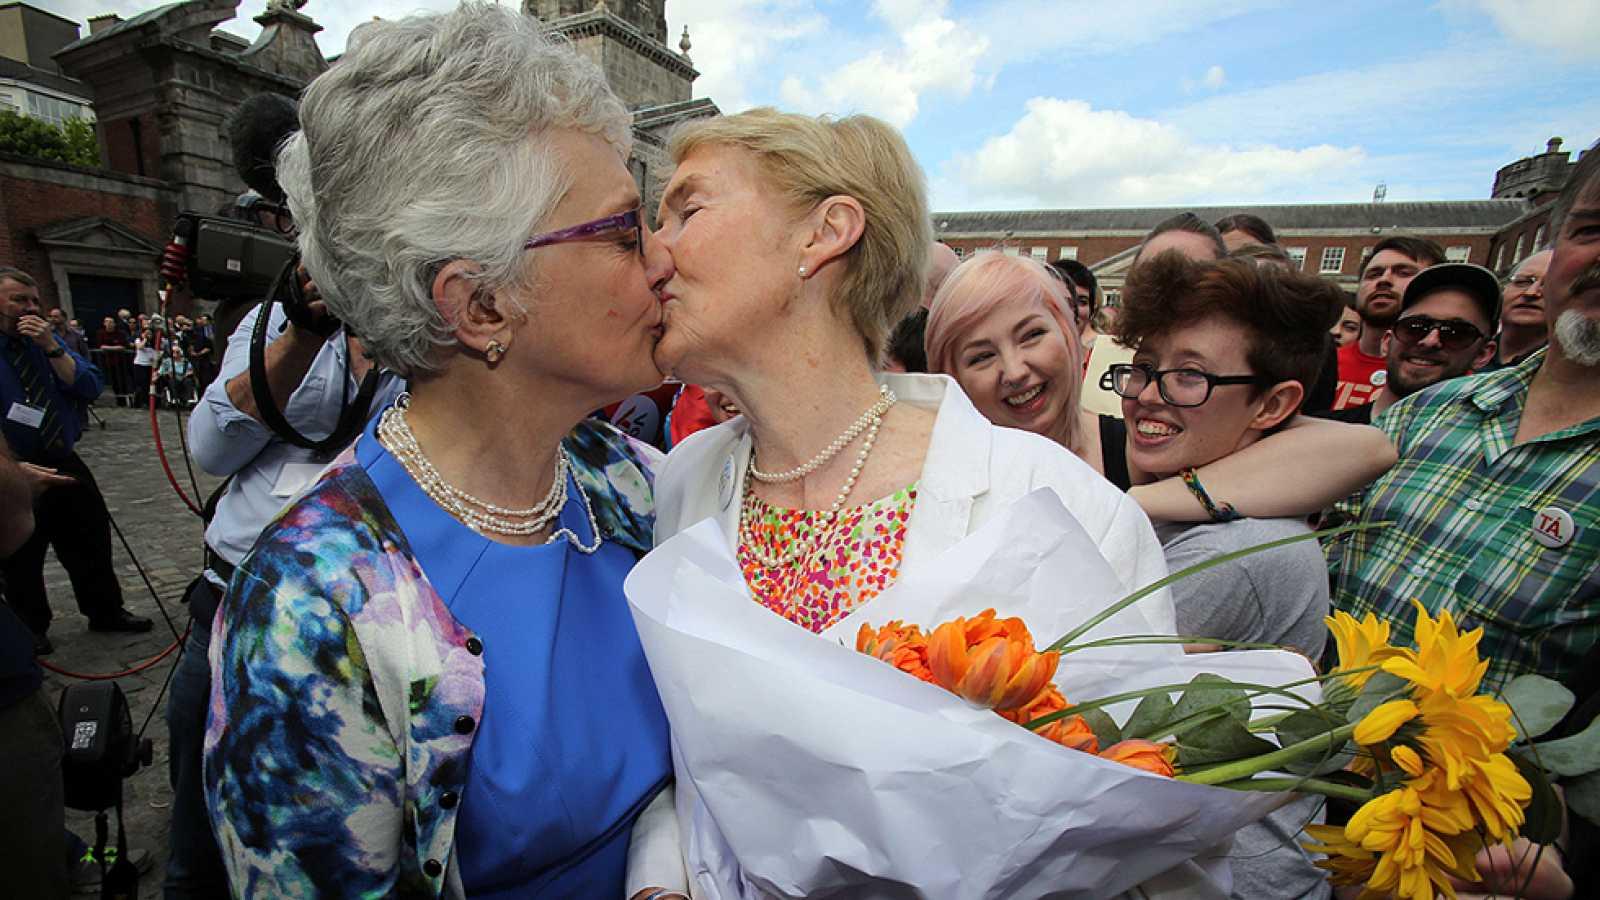 Irlanda aprueba en referéndum el matrimonio homosexual